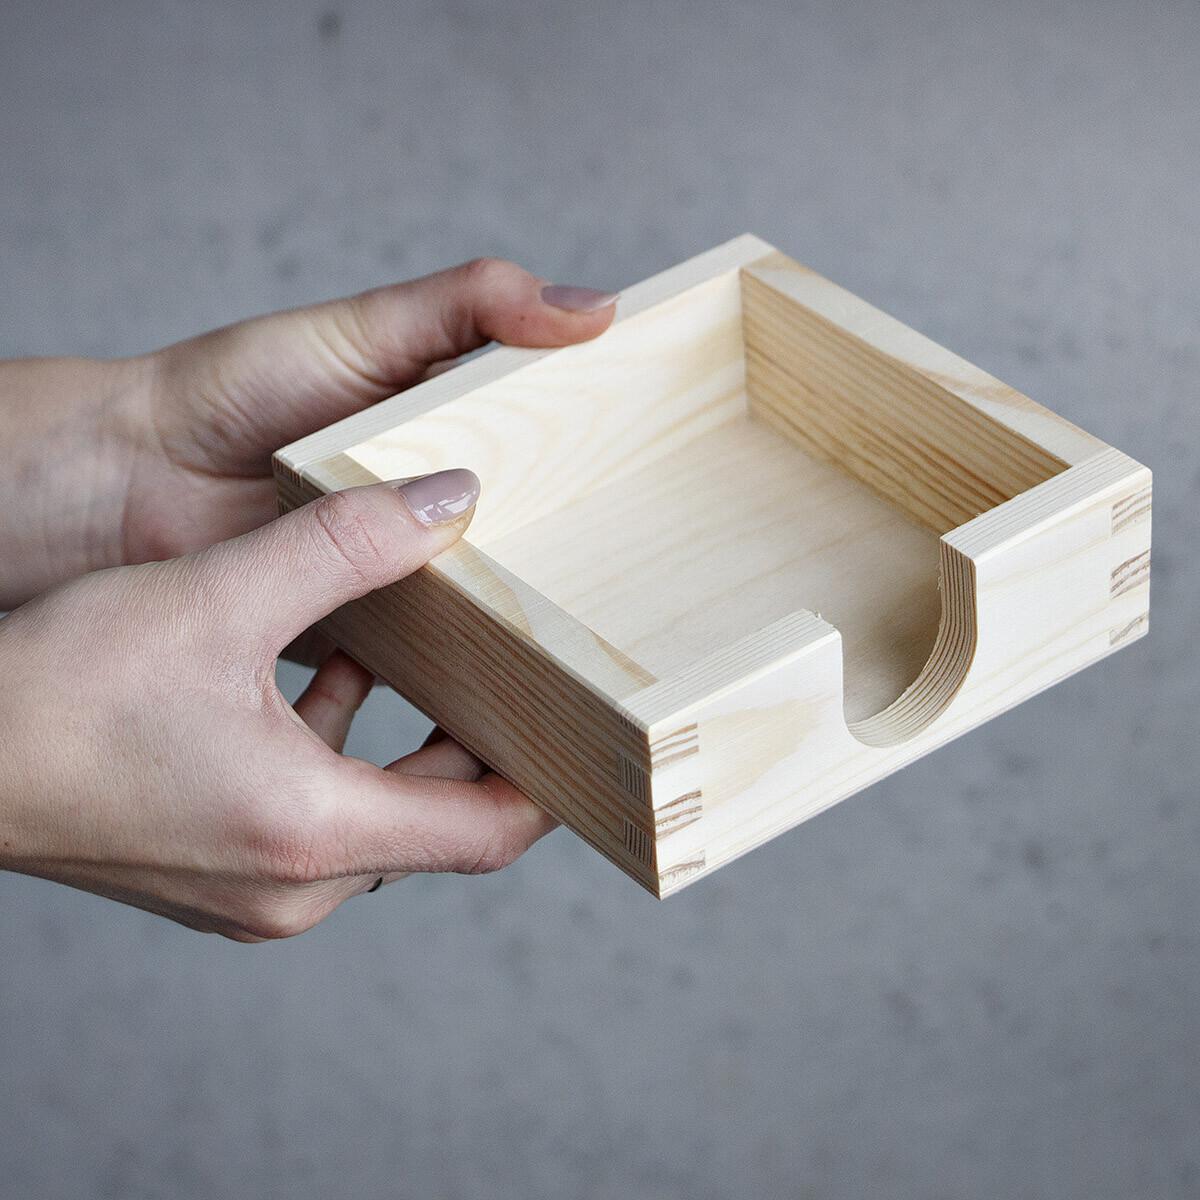 bierdeckelhalter f r quadratische bierdeckel holz. Black Bedroom Furniture Sets. Home Design Ideas